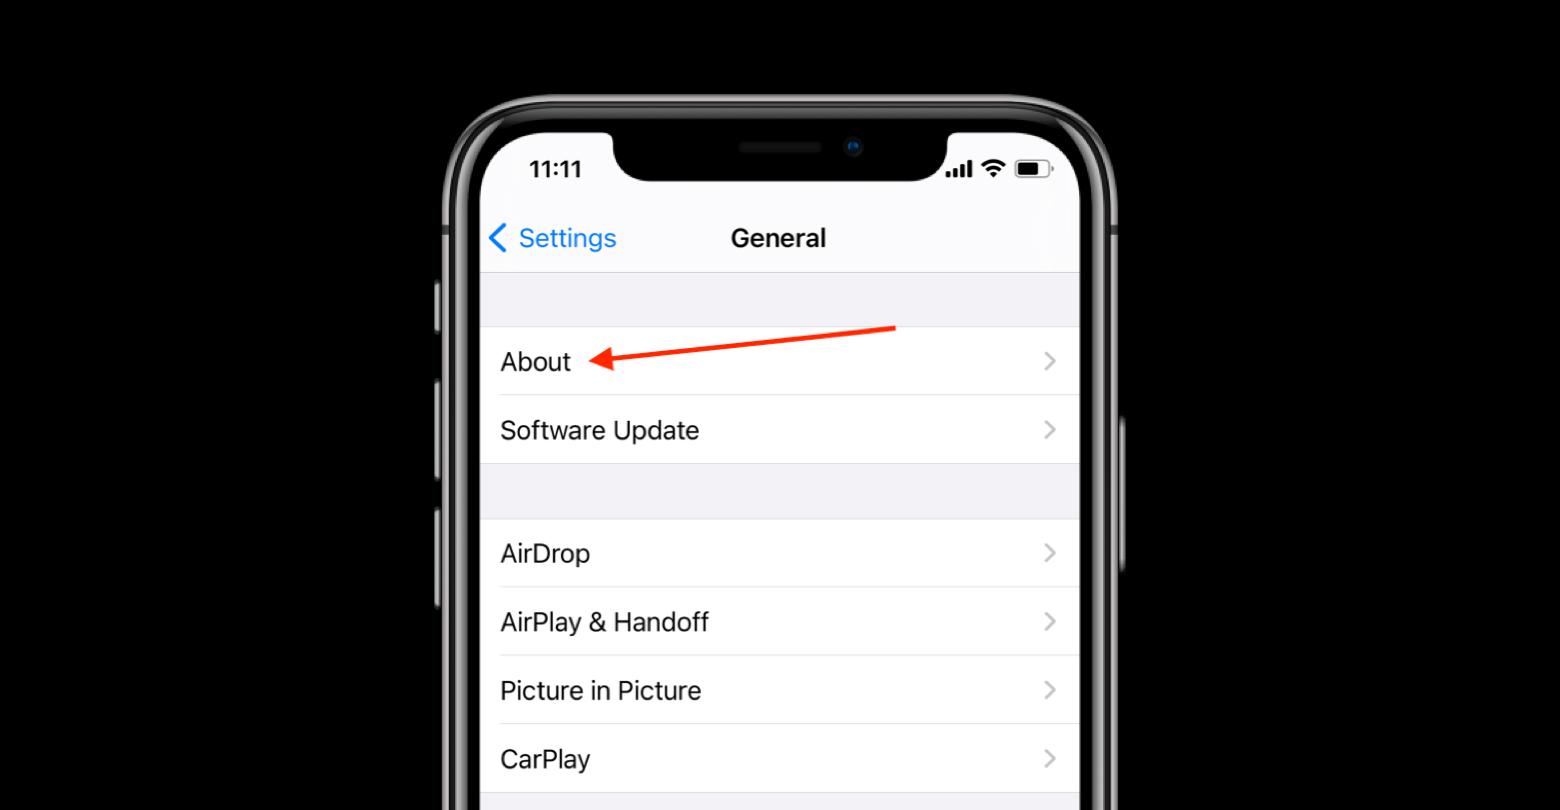 general-settings-menu-ios-14